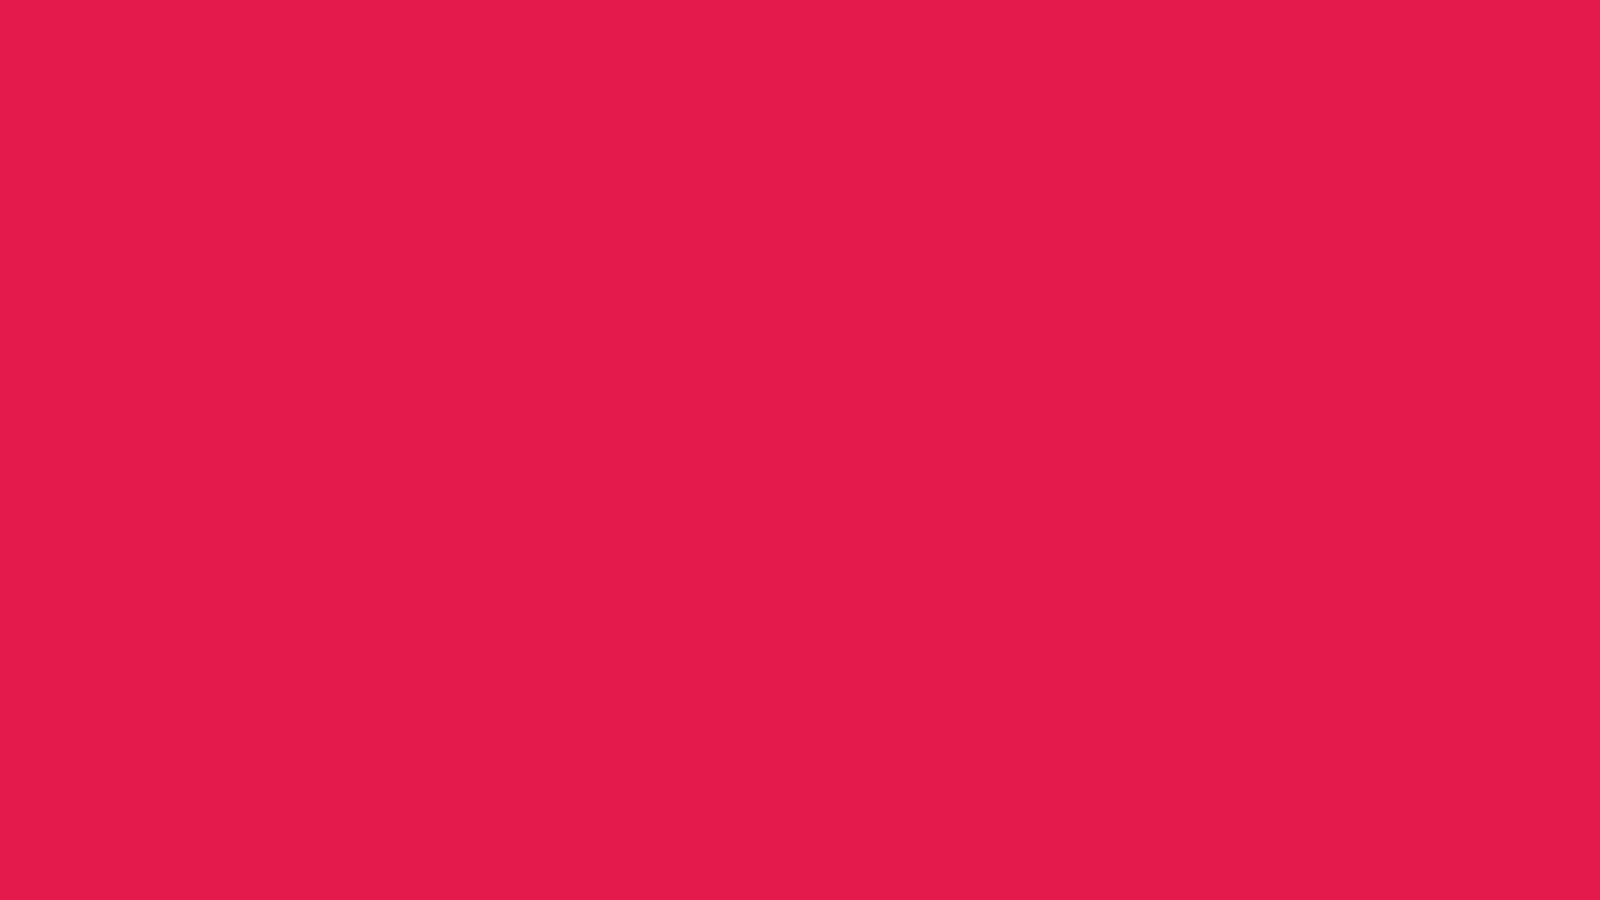 1600x900 Spanish Crimson Solid Color Background